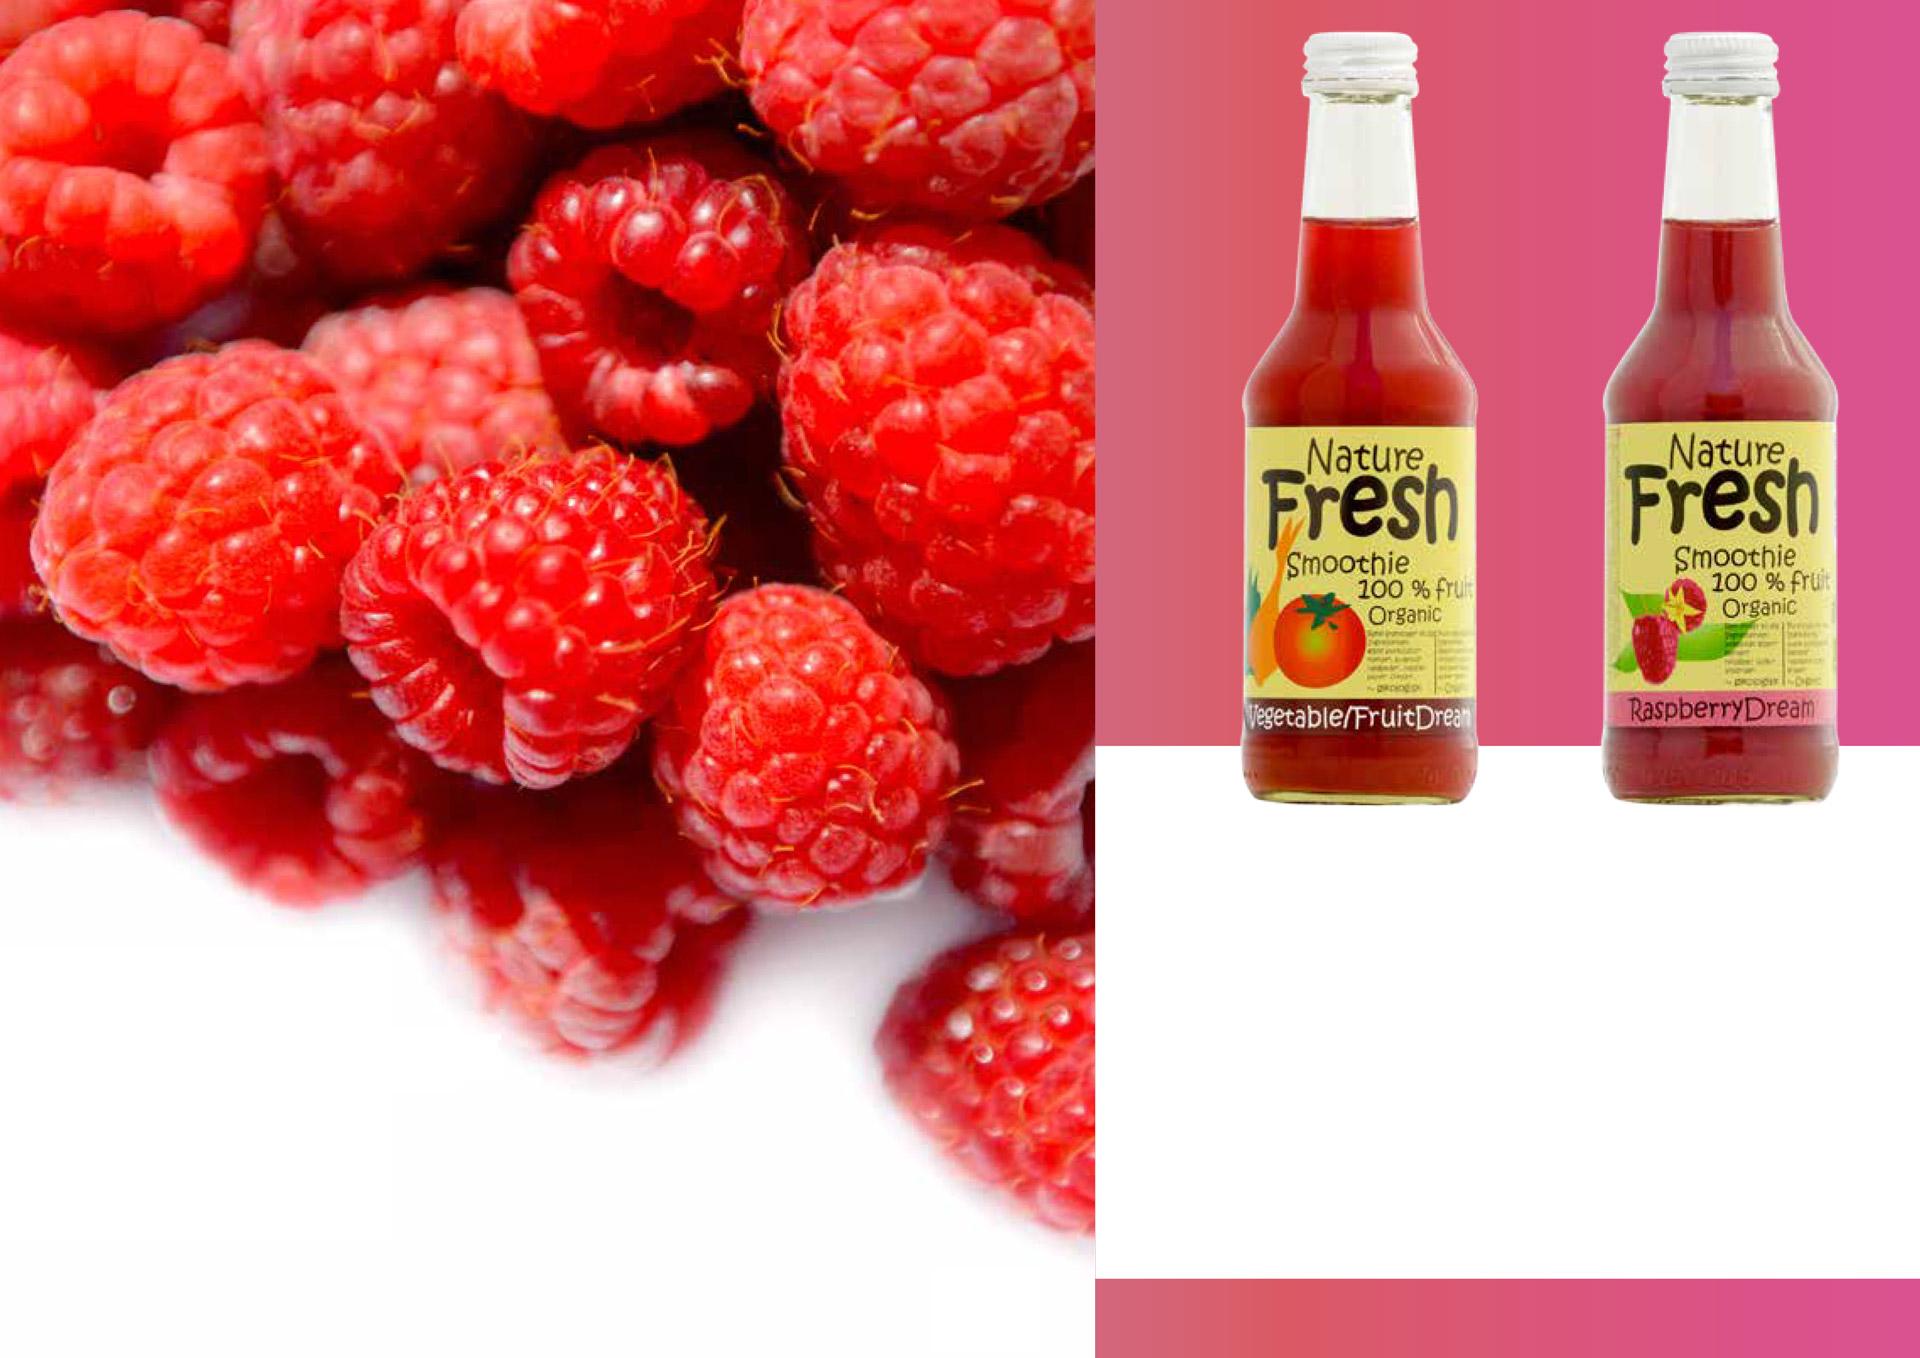 'Organic juice drinks, natural cool taste'